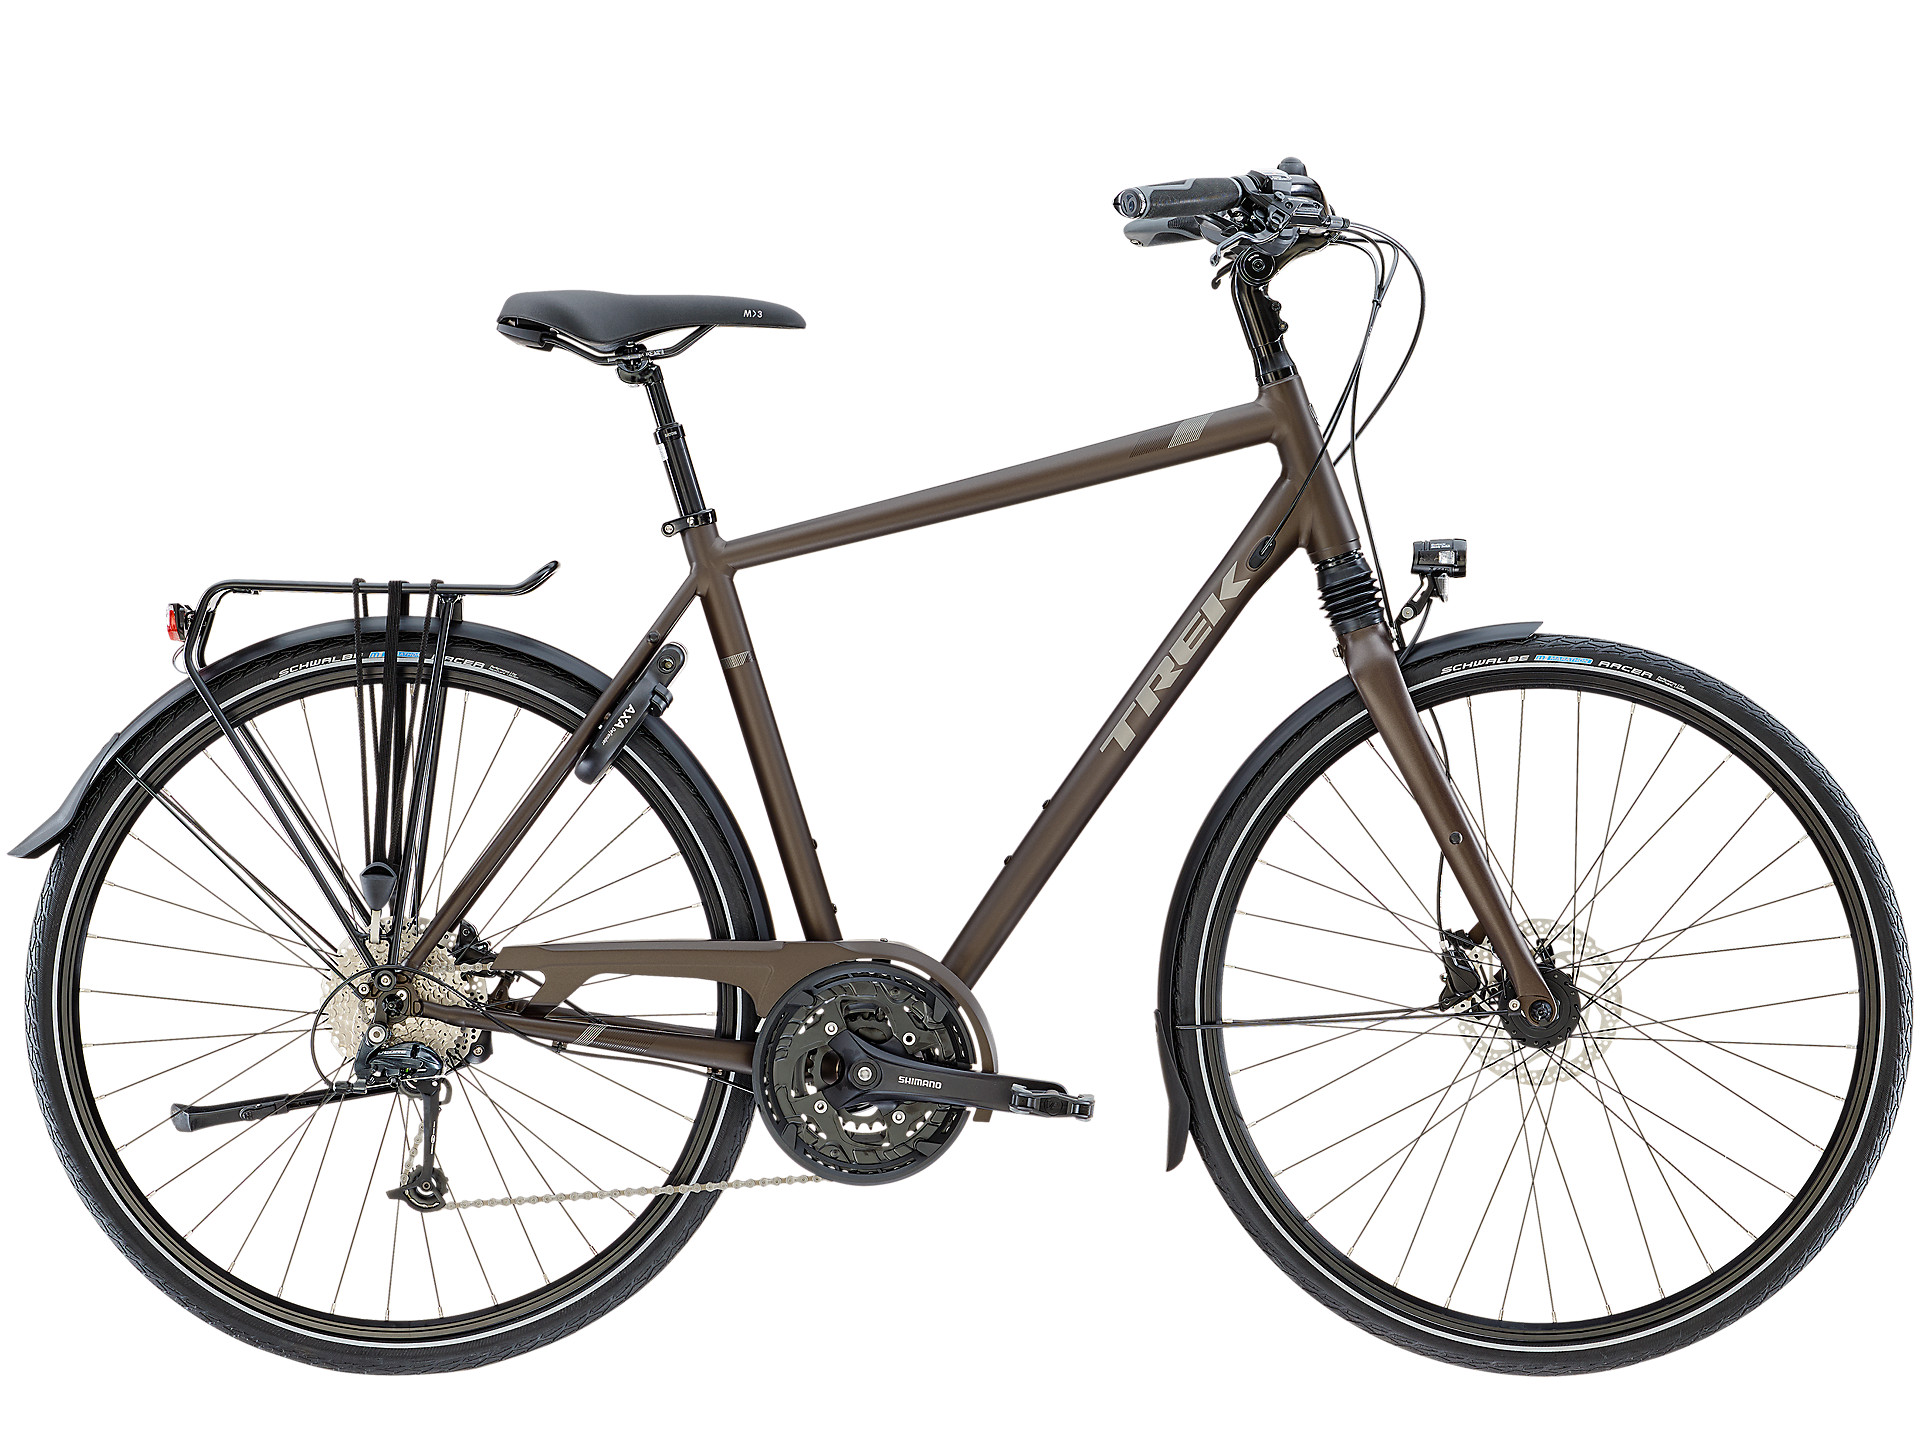 T500 Trek Bikes Be